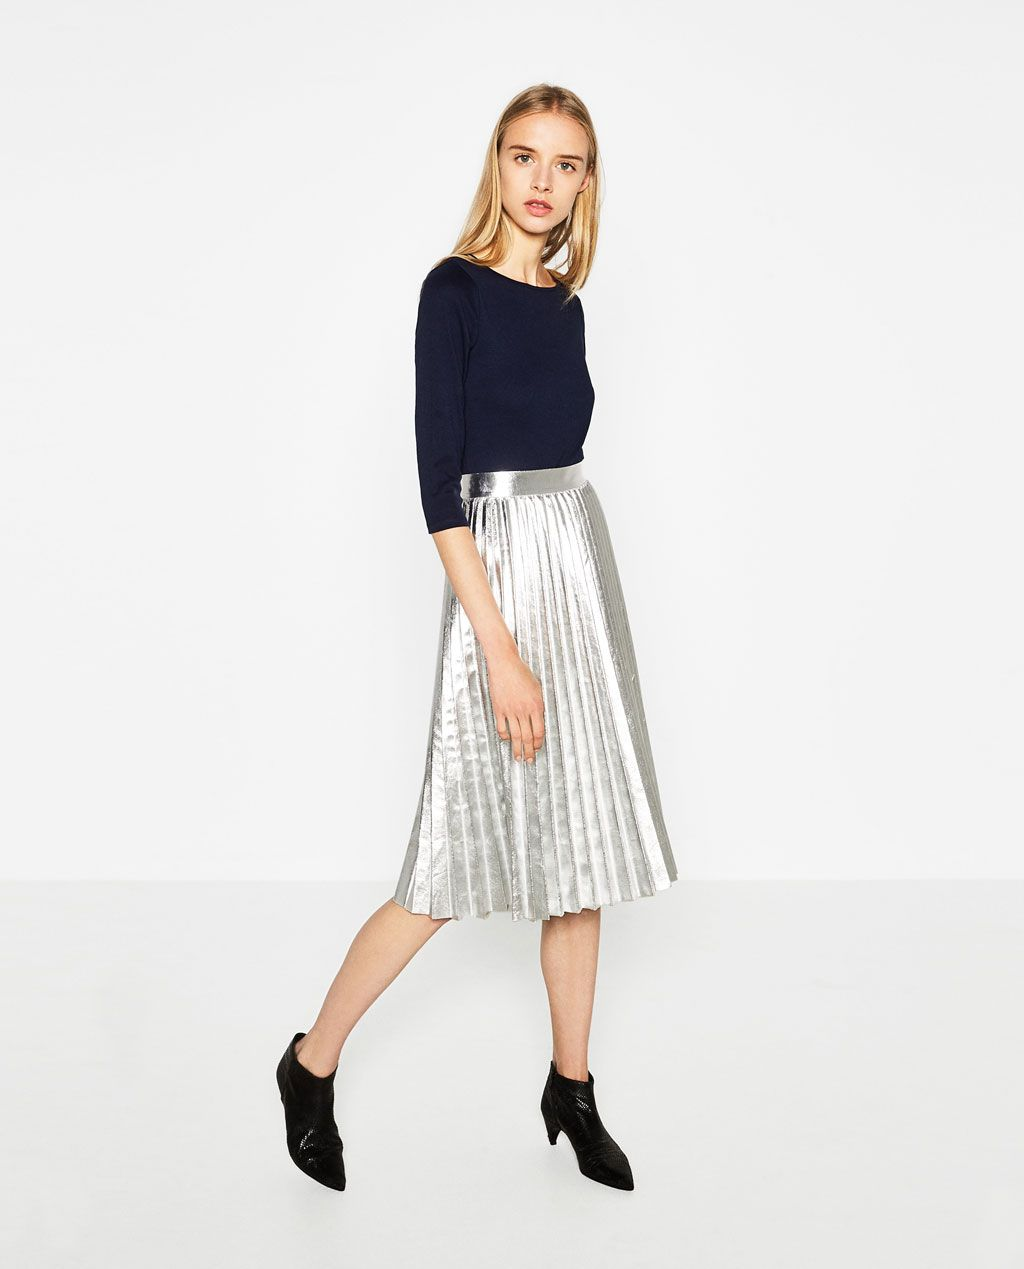 METALLIC ACCORDION-PLEAT SKIRT From Zara 4990 RSD | U21a3 Fashion U21a2 | Pinterest | Metallic Pleated ...